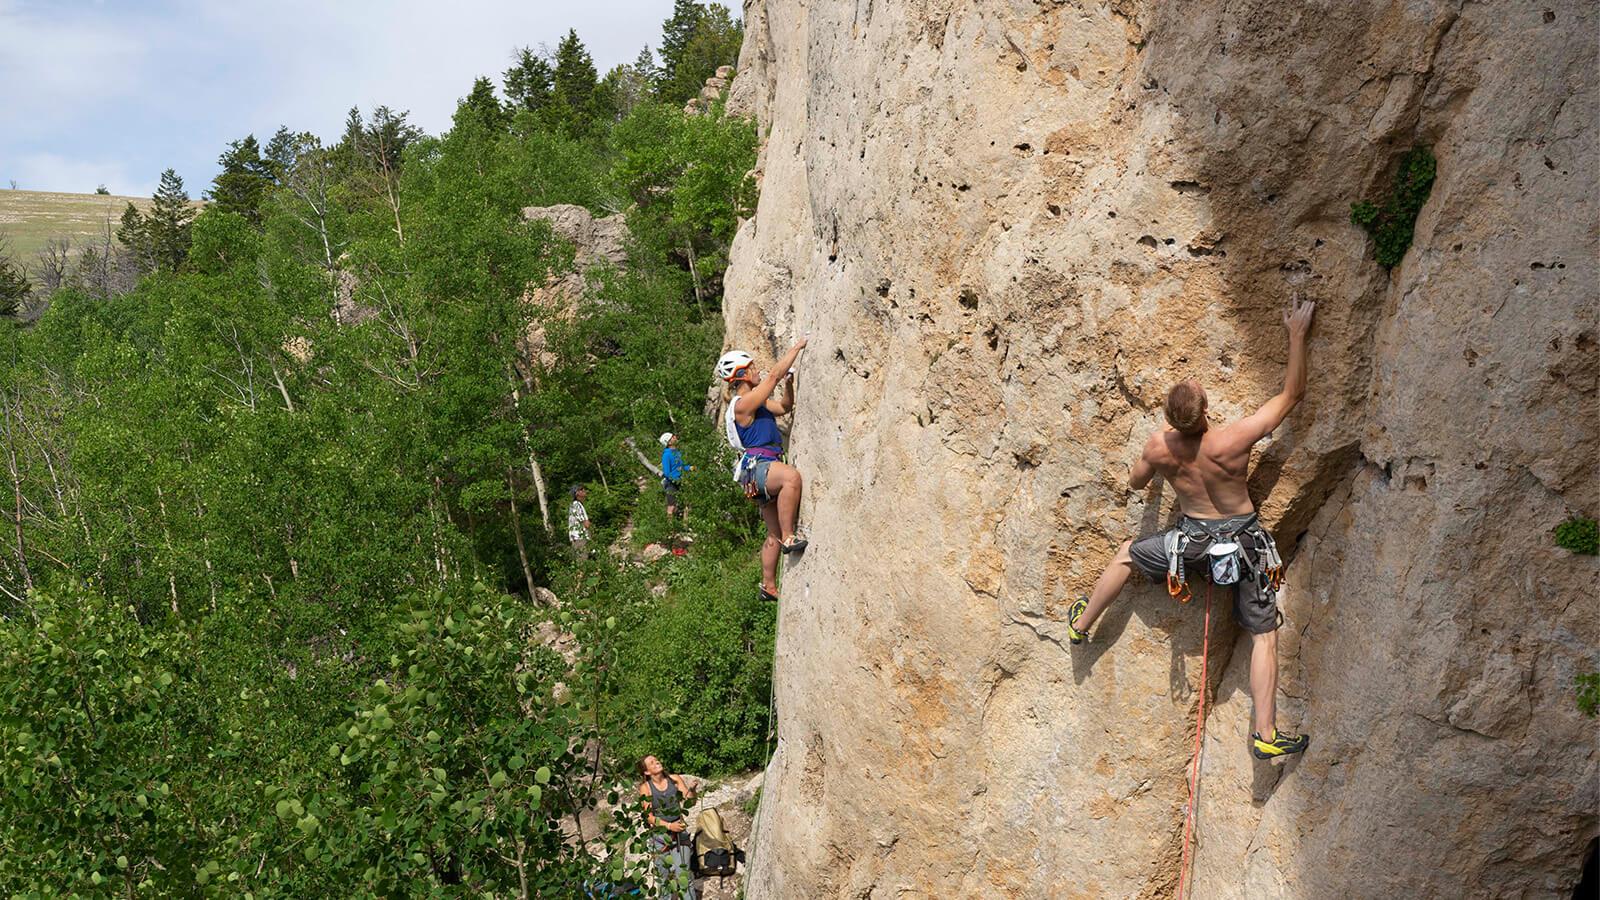 Climbers scaling rock